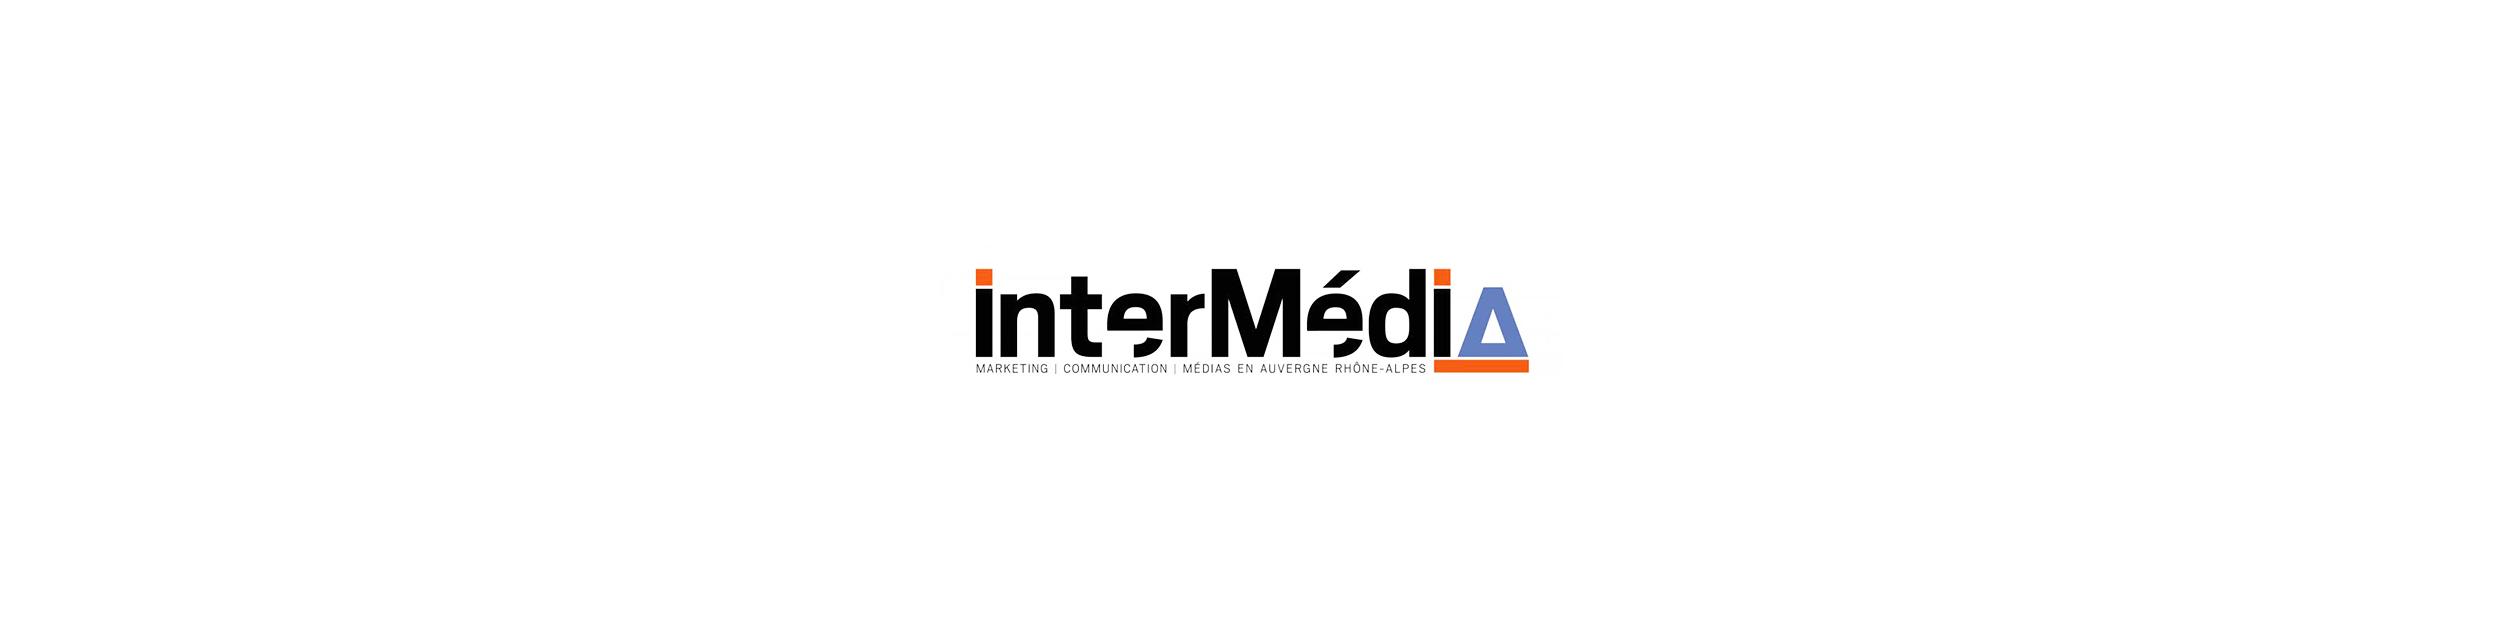 https://agence-ultramedia.com/